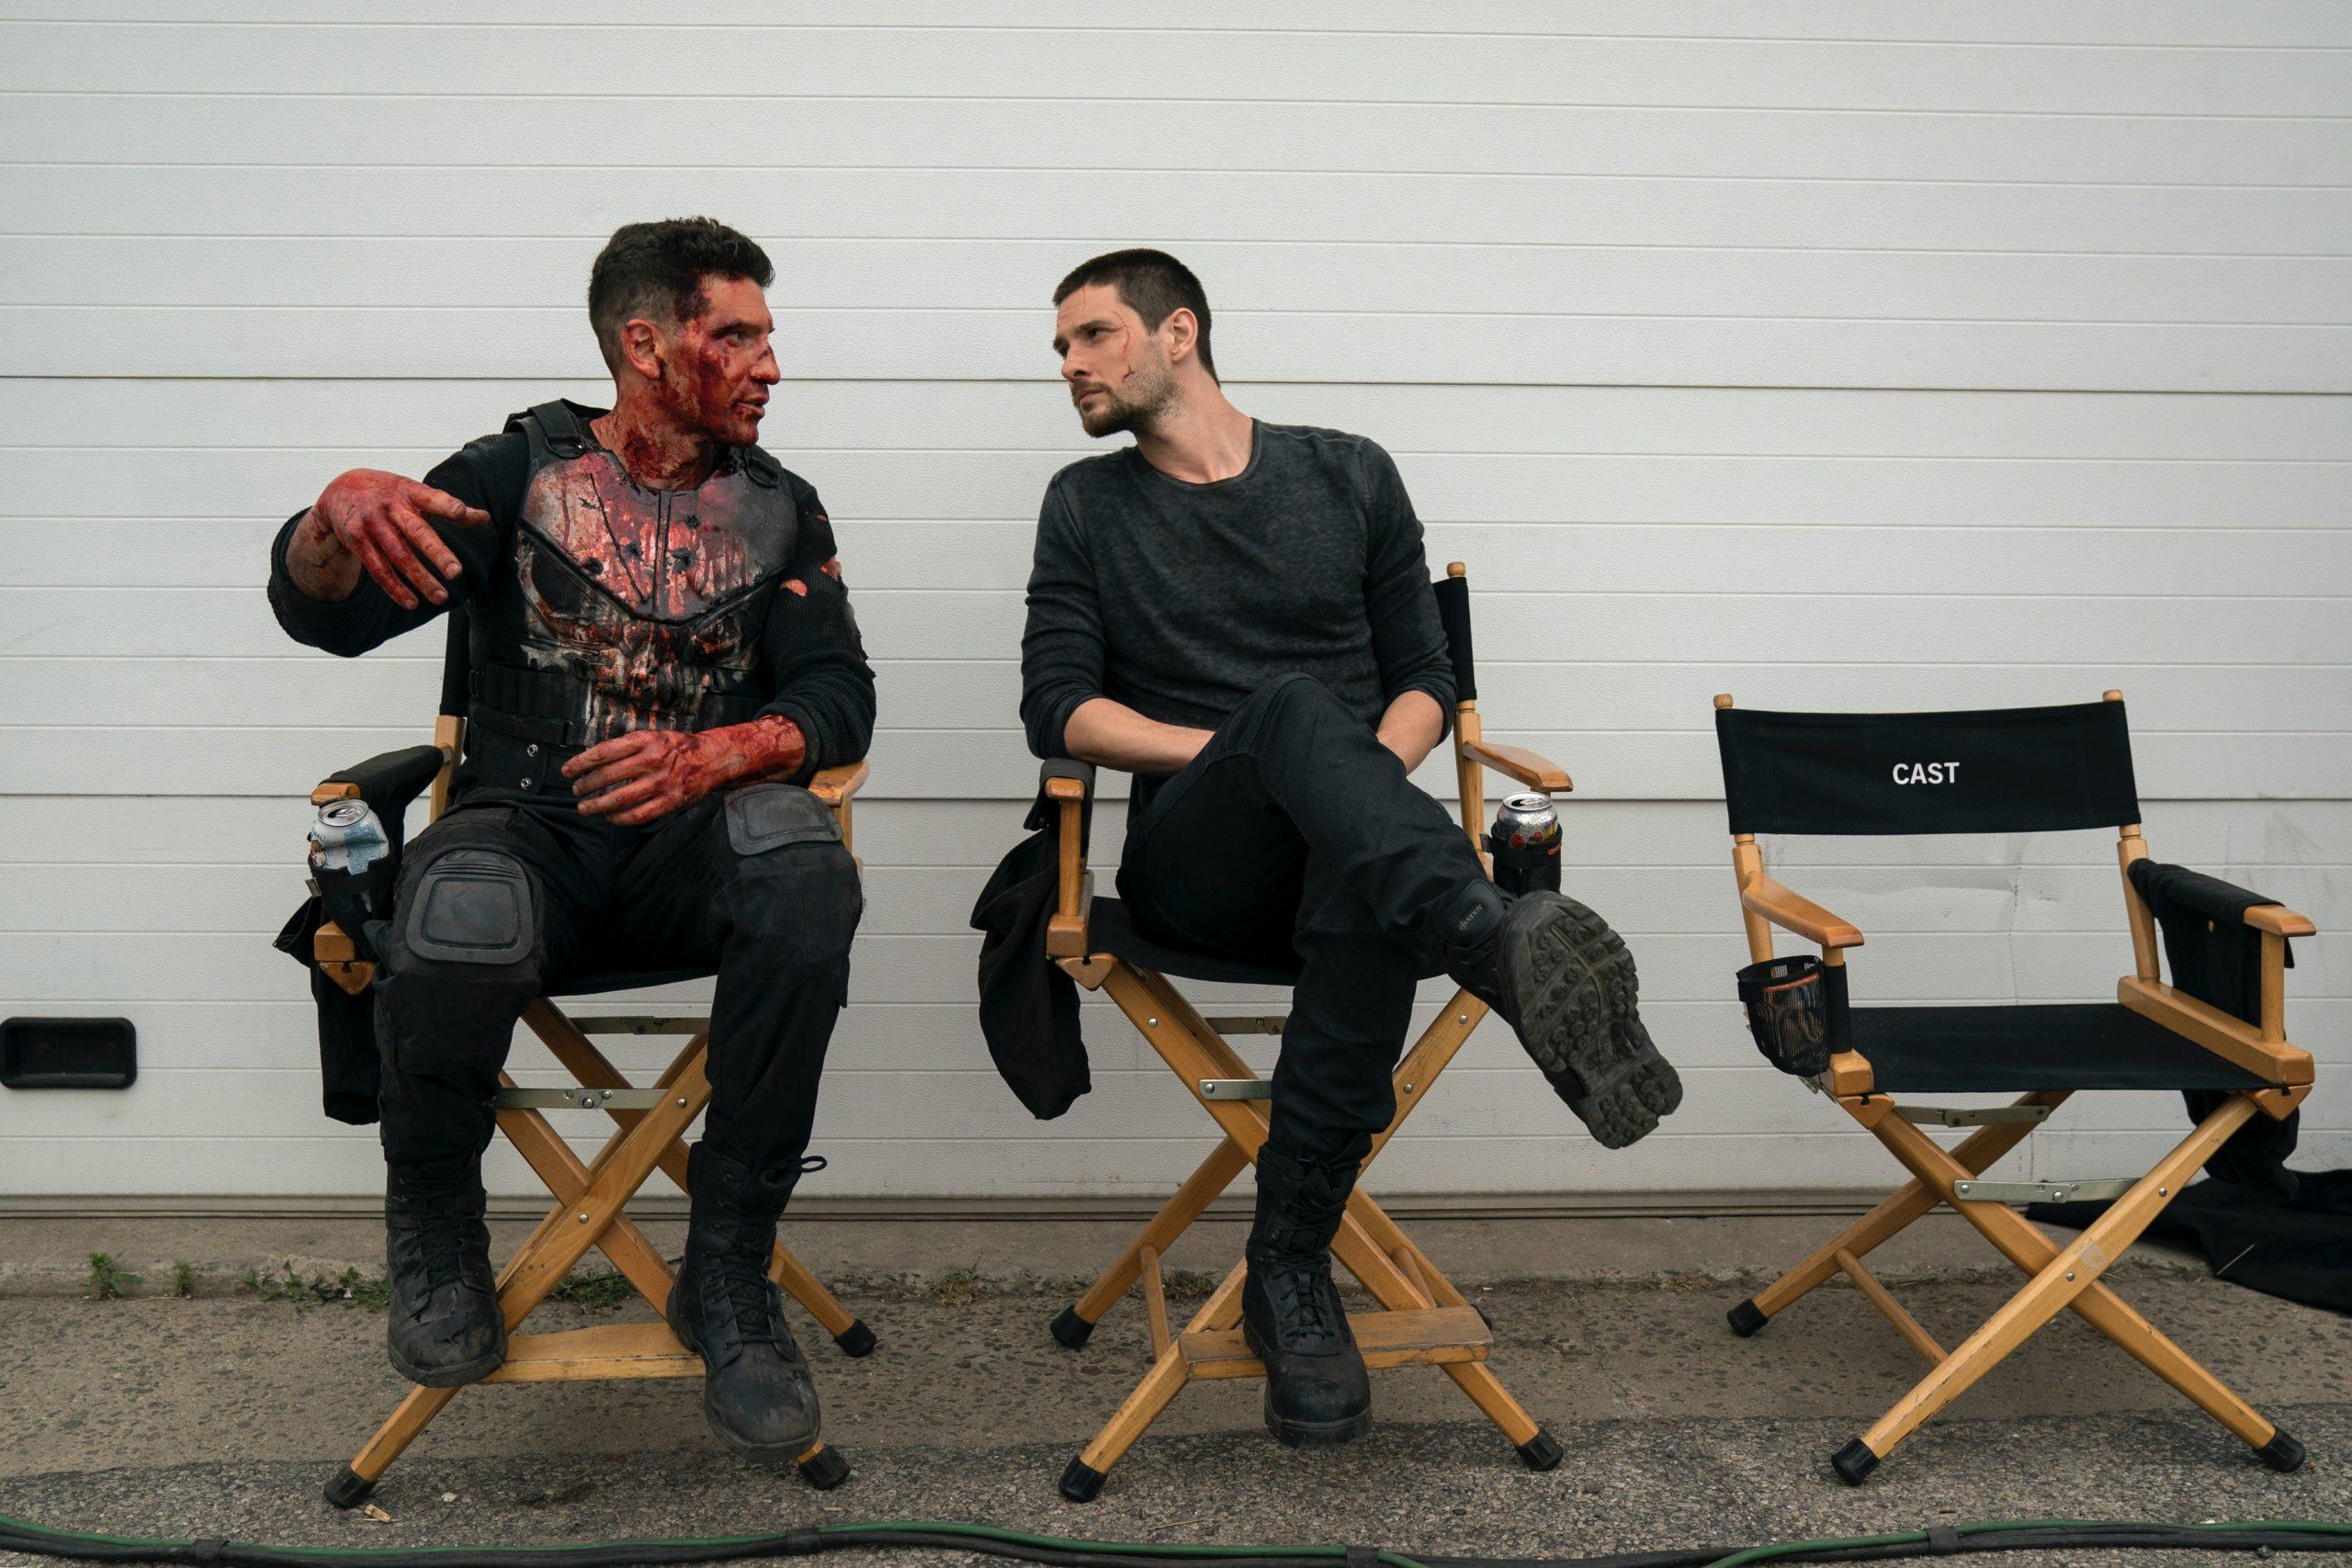 Will Netflix Release Third Season Of The Punishers?